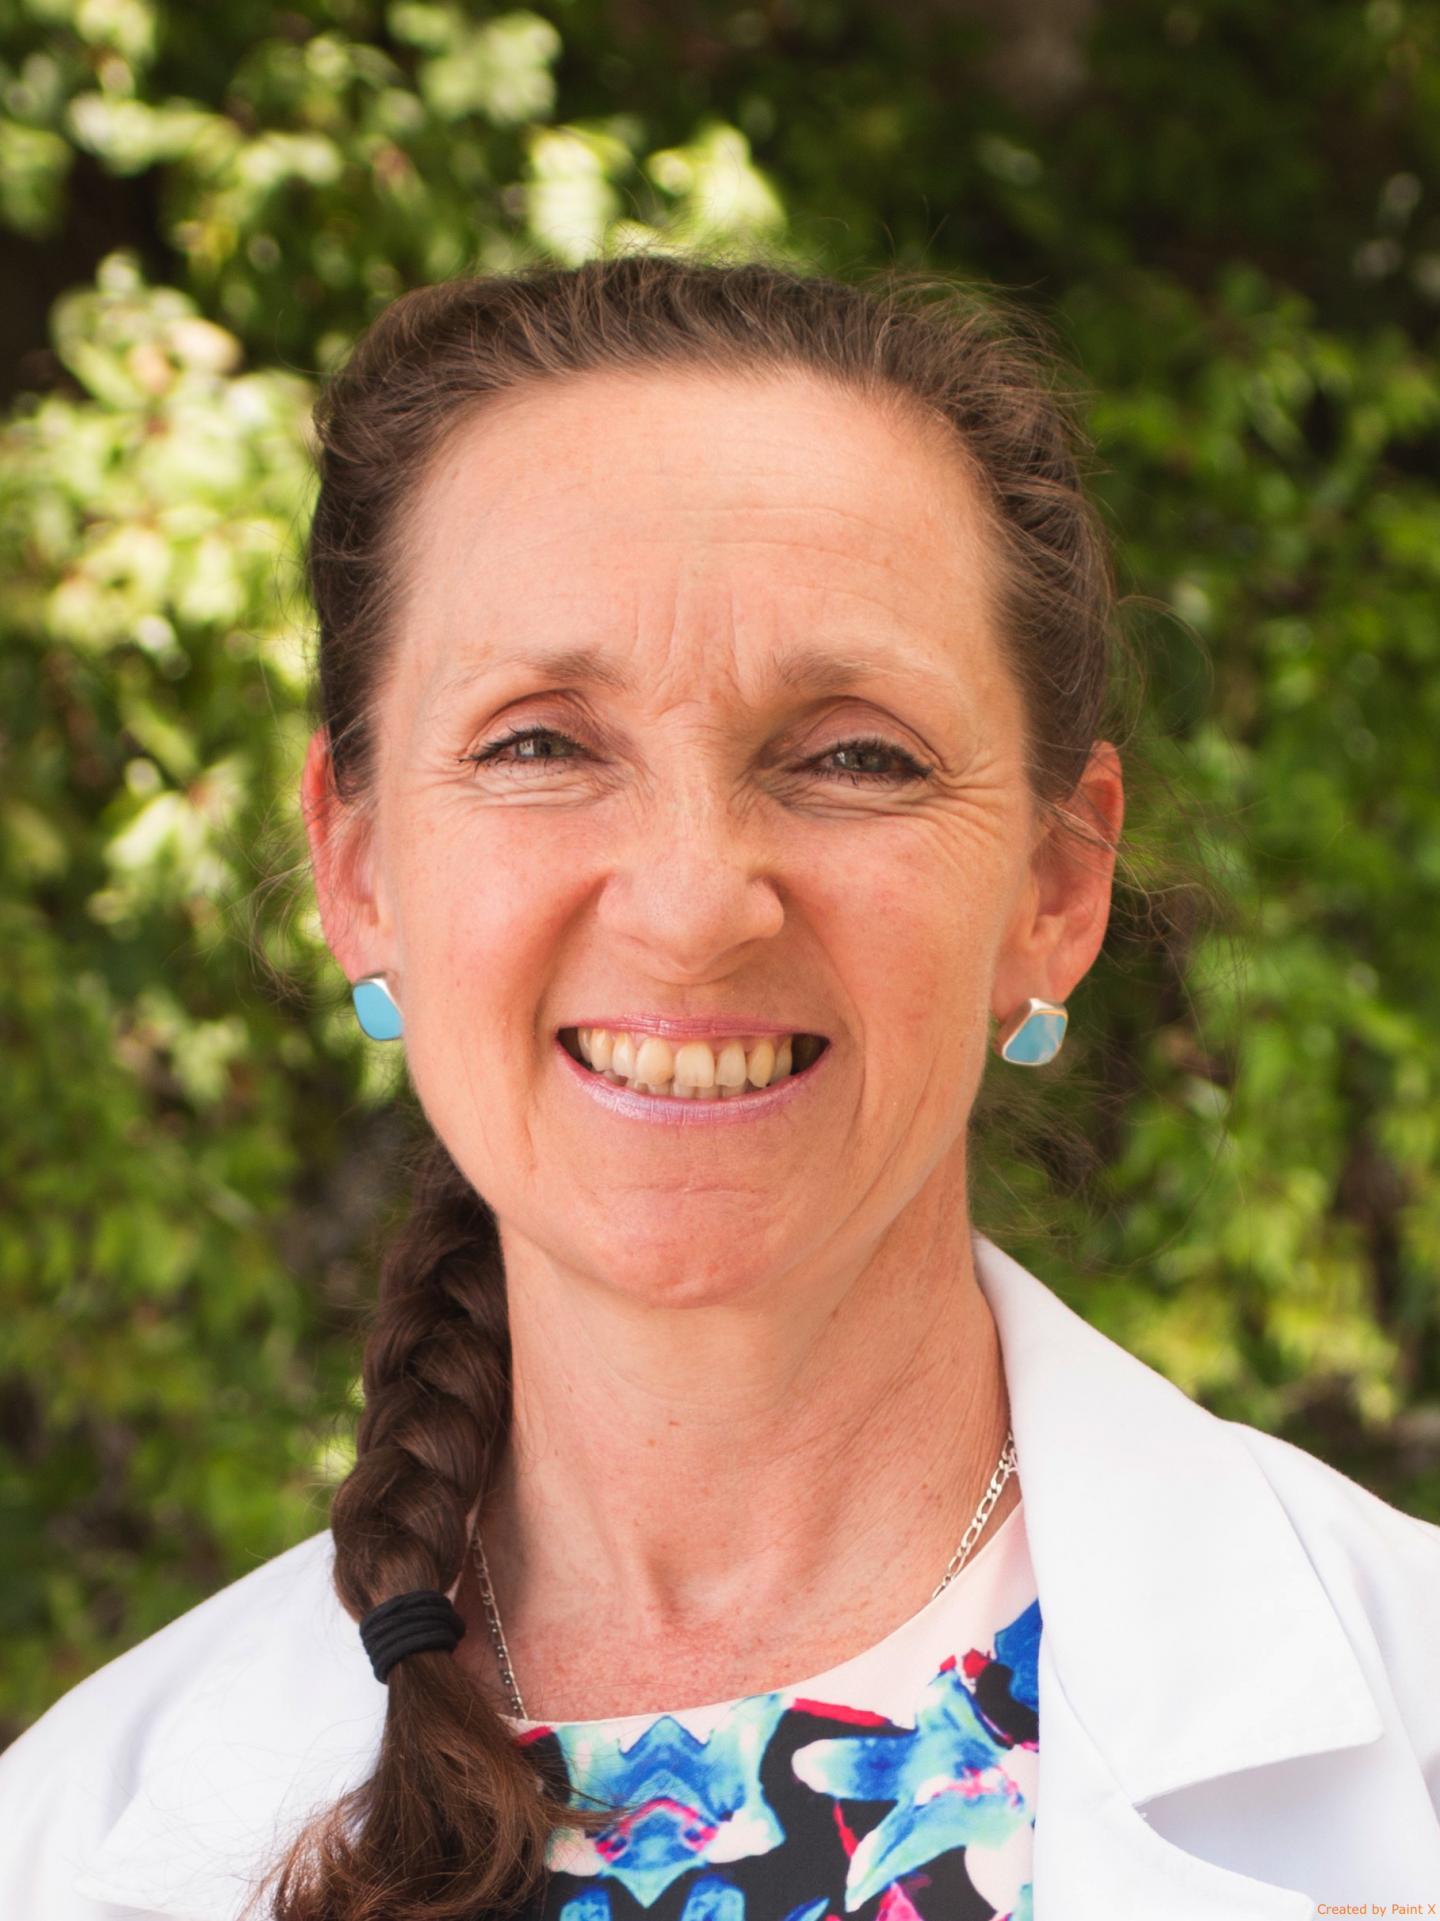 Dr. Desiree Larenas-Linneman, Hospital Medica Sur